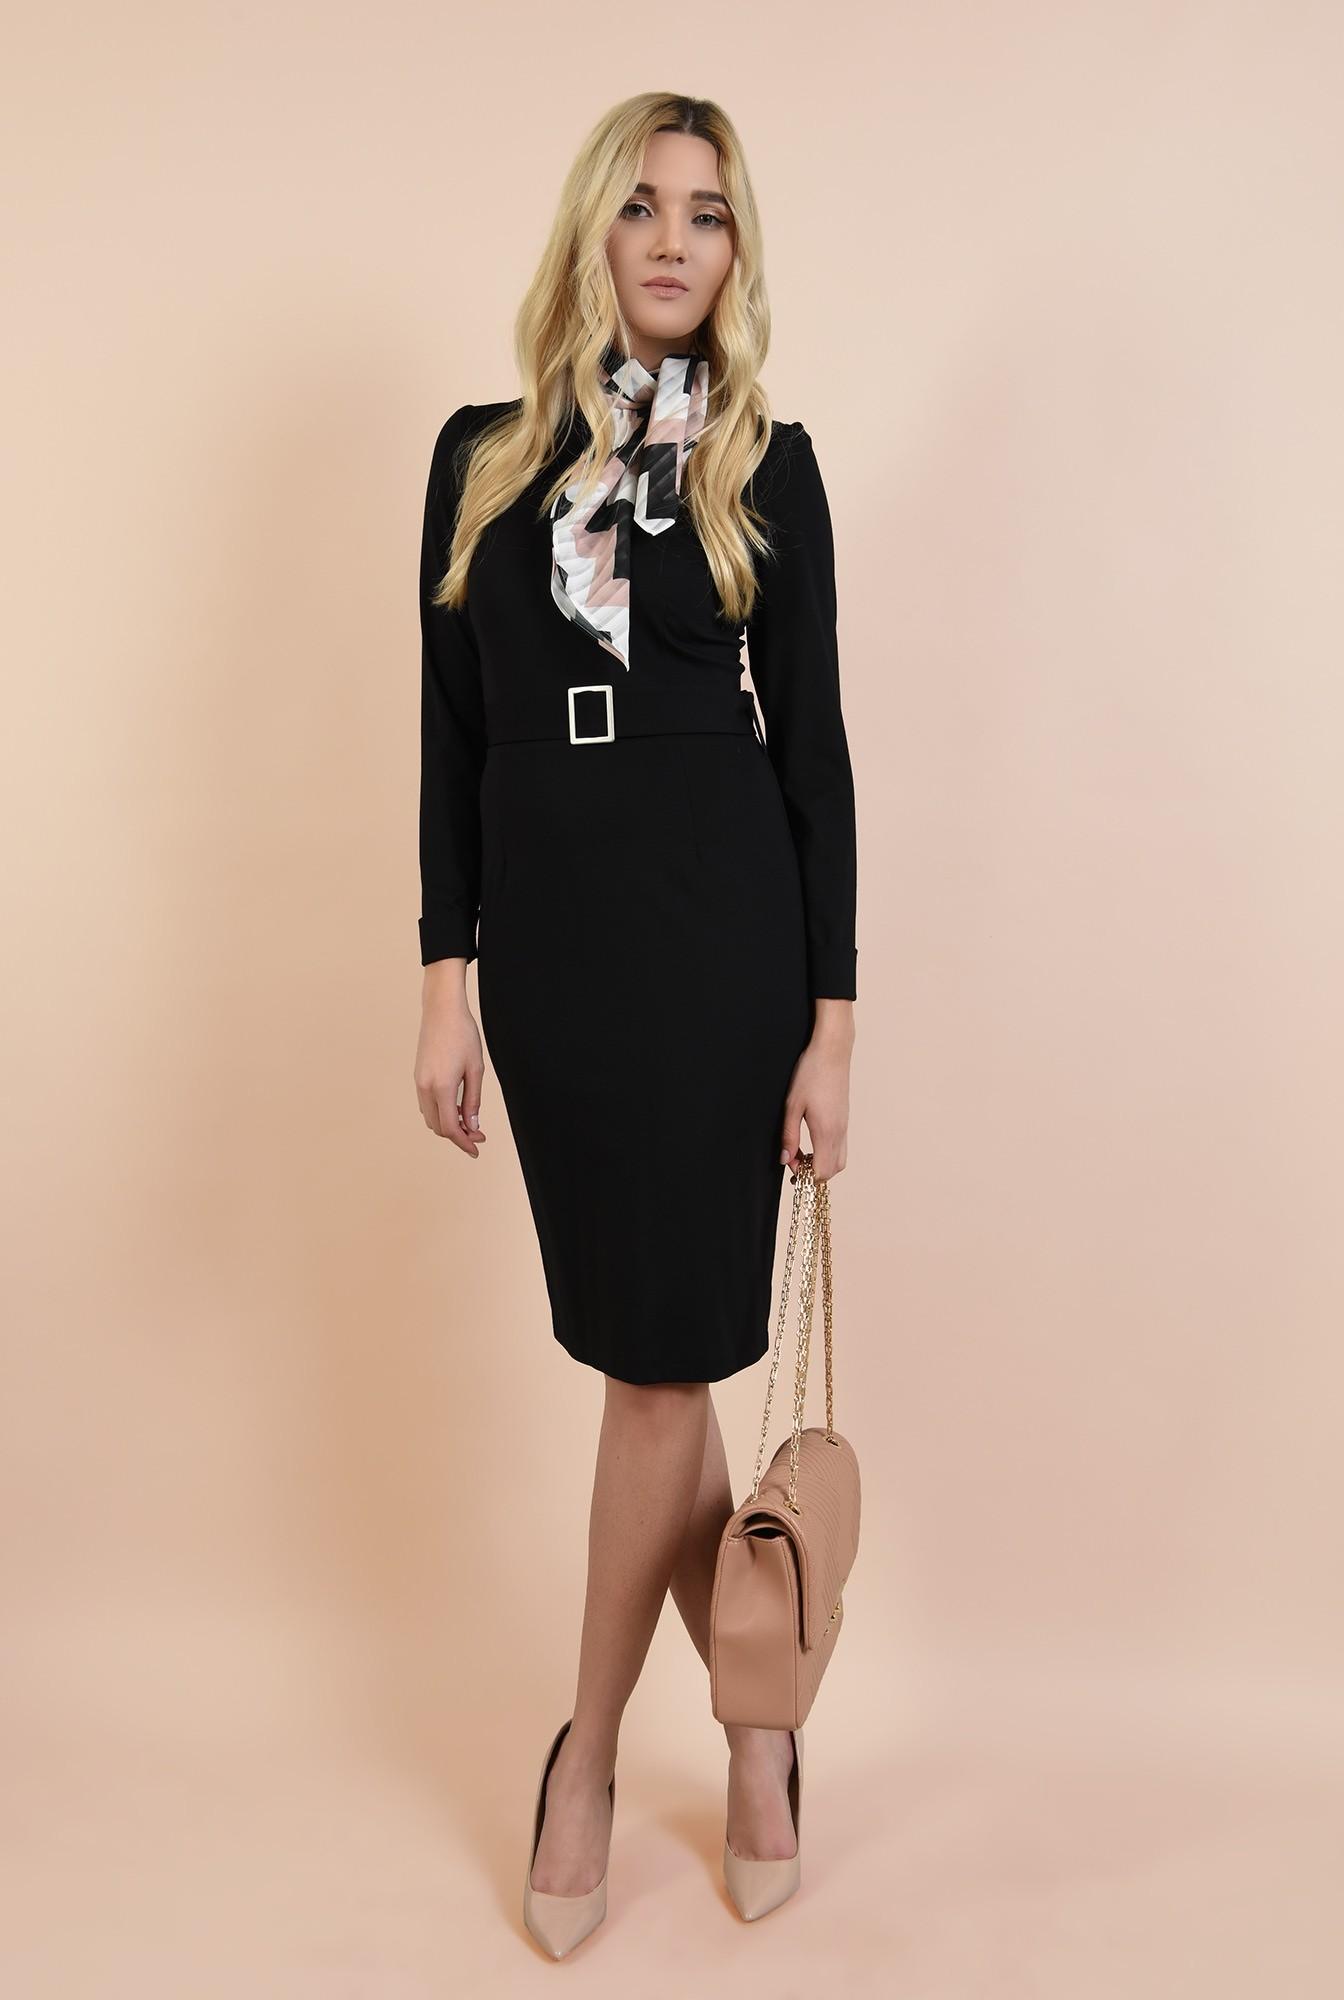 3 - 360 - rochie neagra, casual, bodycon, cu centura, catarama argintie